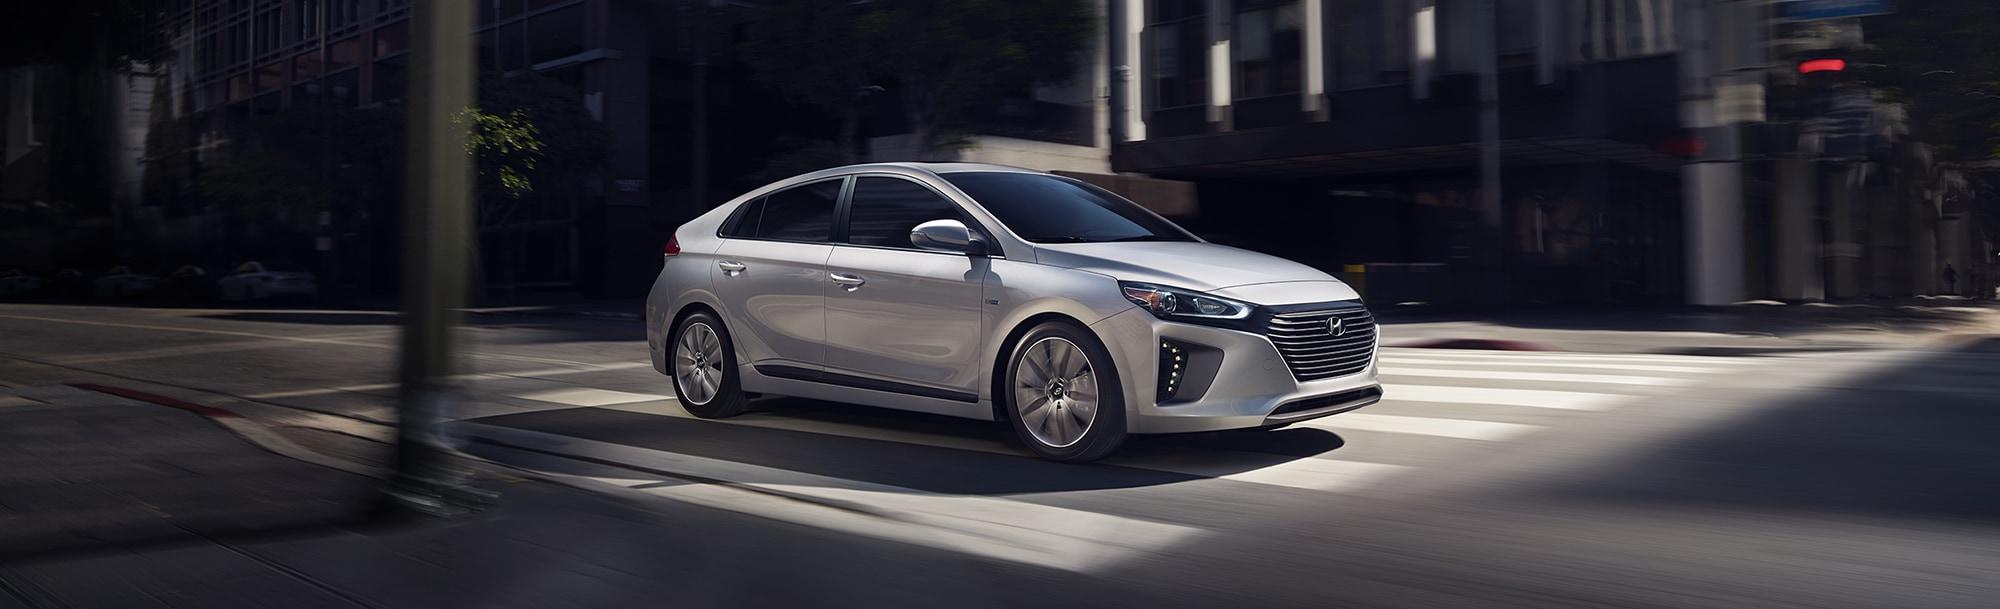 2017 Hyundai Ioniq Jacksonville NC